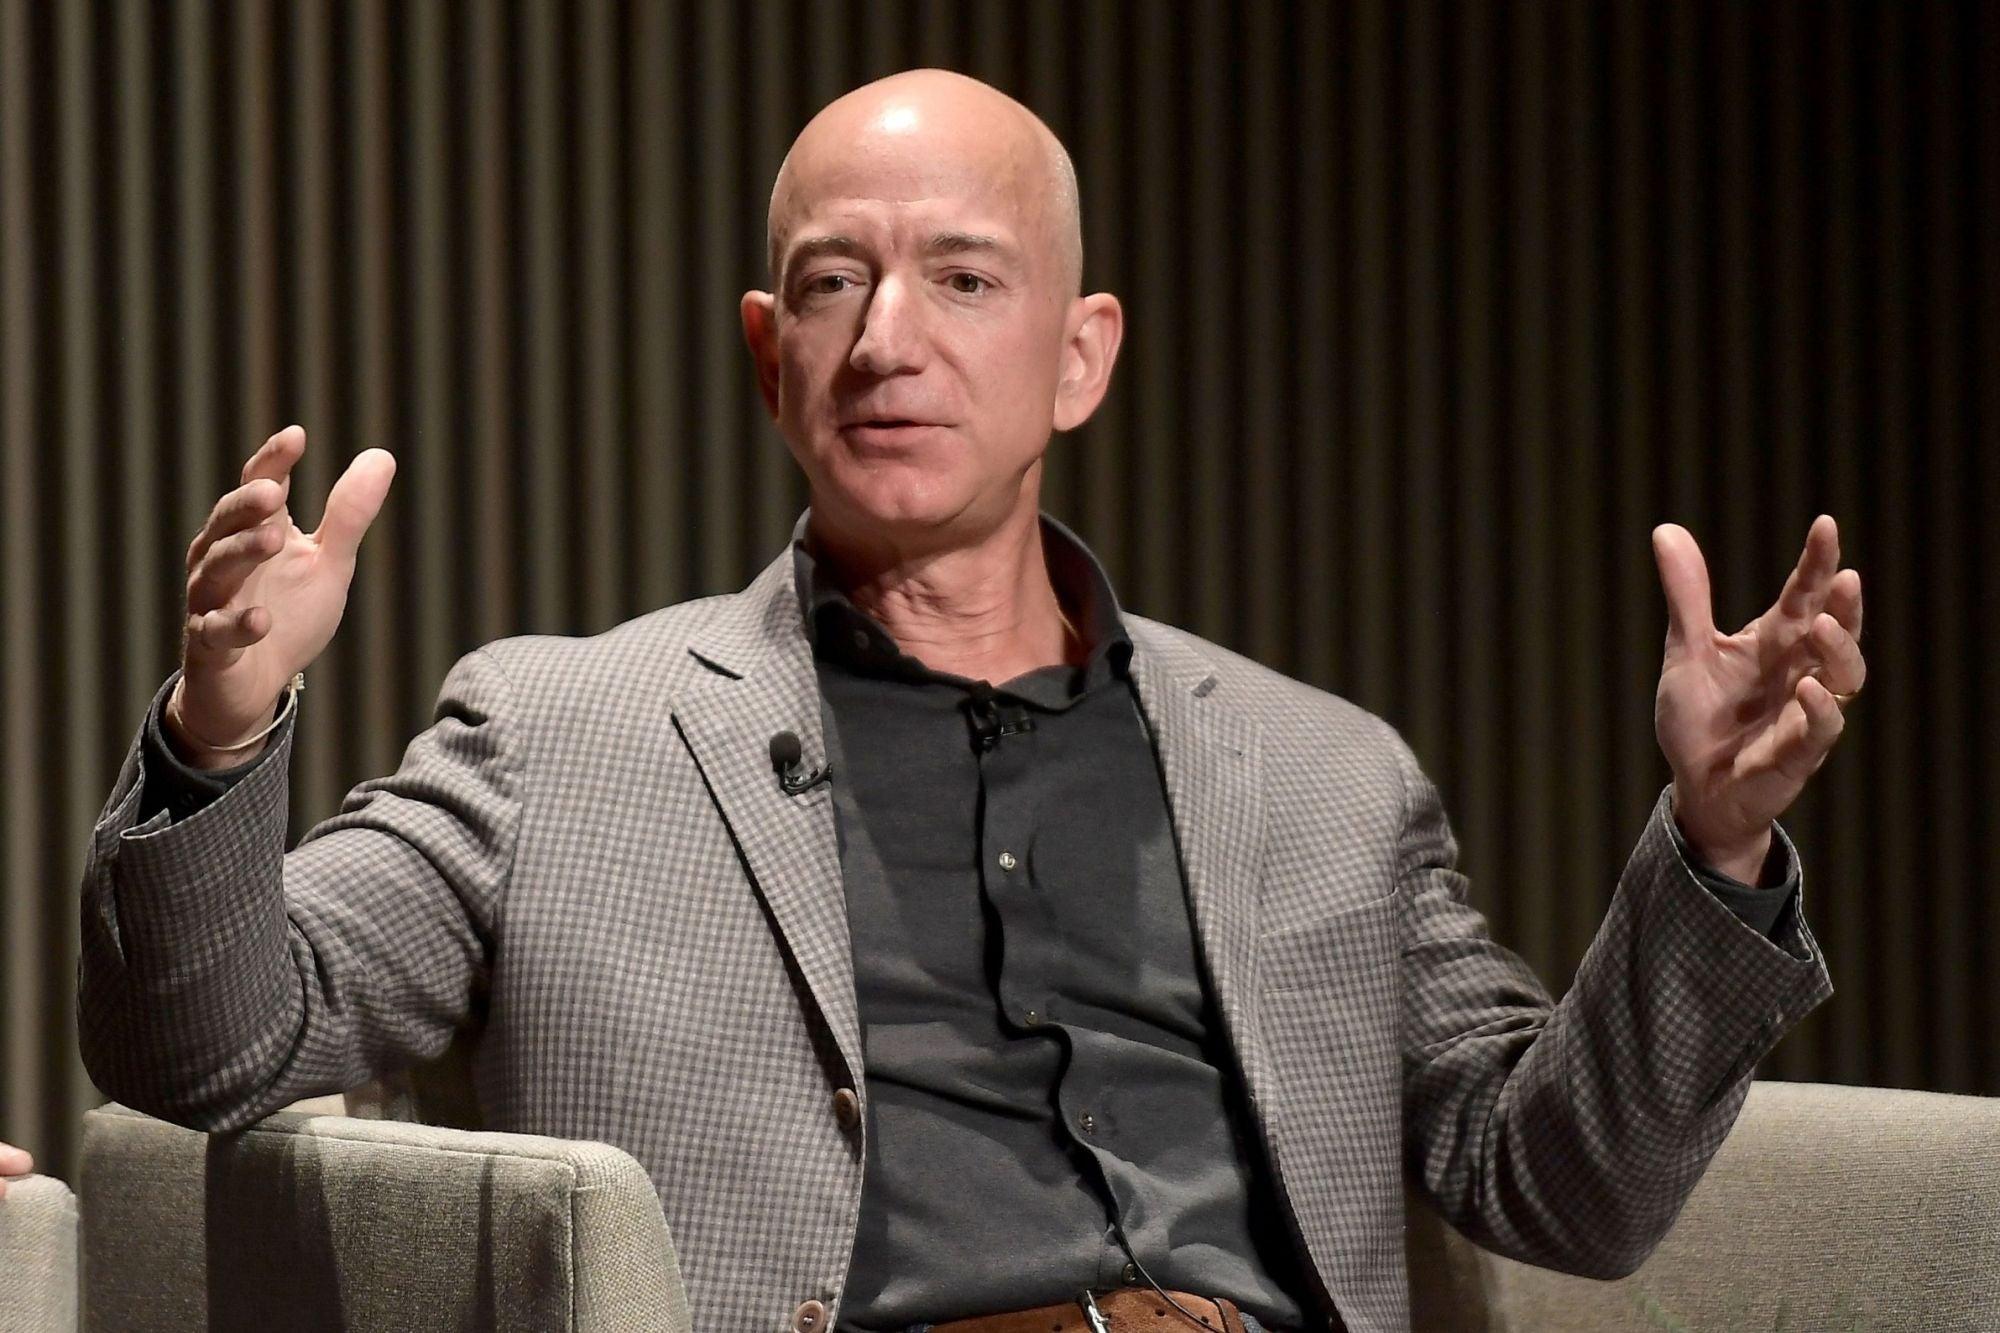 entrepreneur.com - Sam Barry - Billionaires Like Warren Buffett, Jeff Bezos and Mark Cuban Live by Ancient Stoic Philosophy